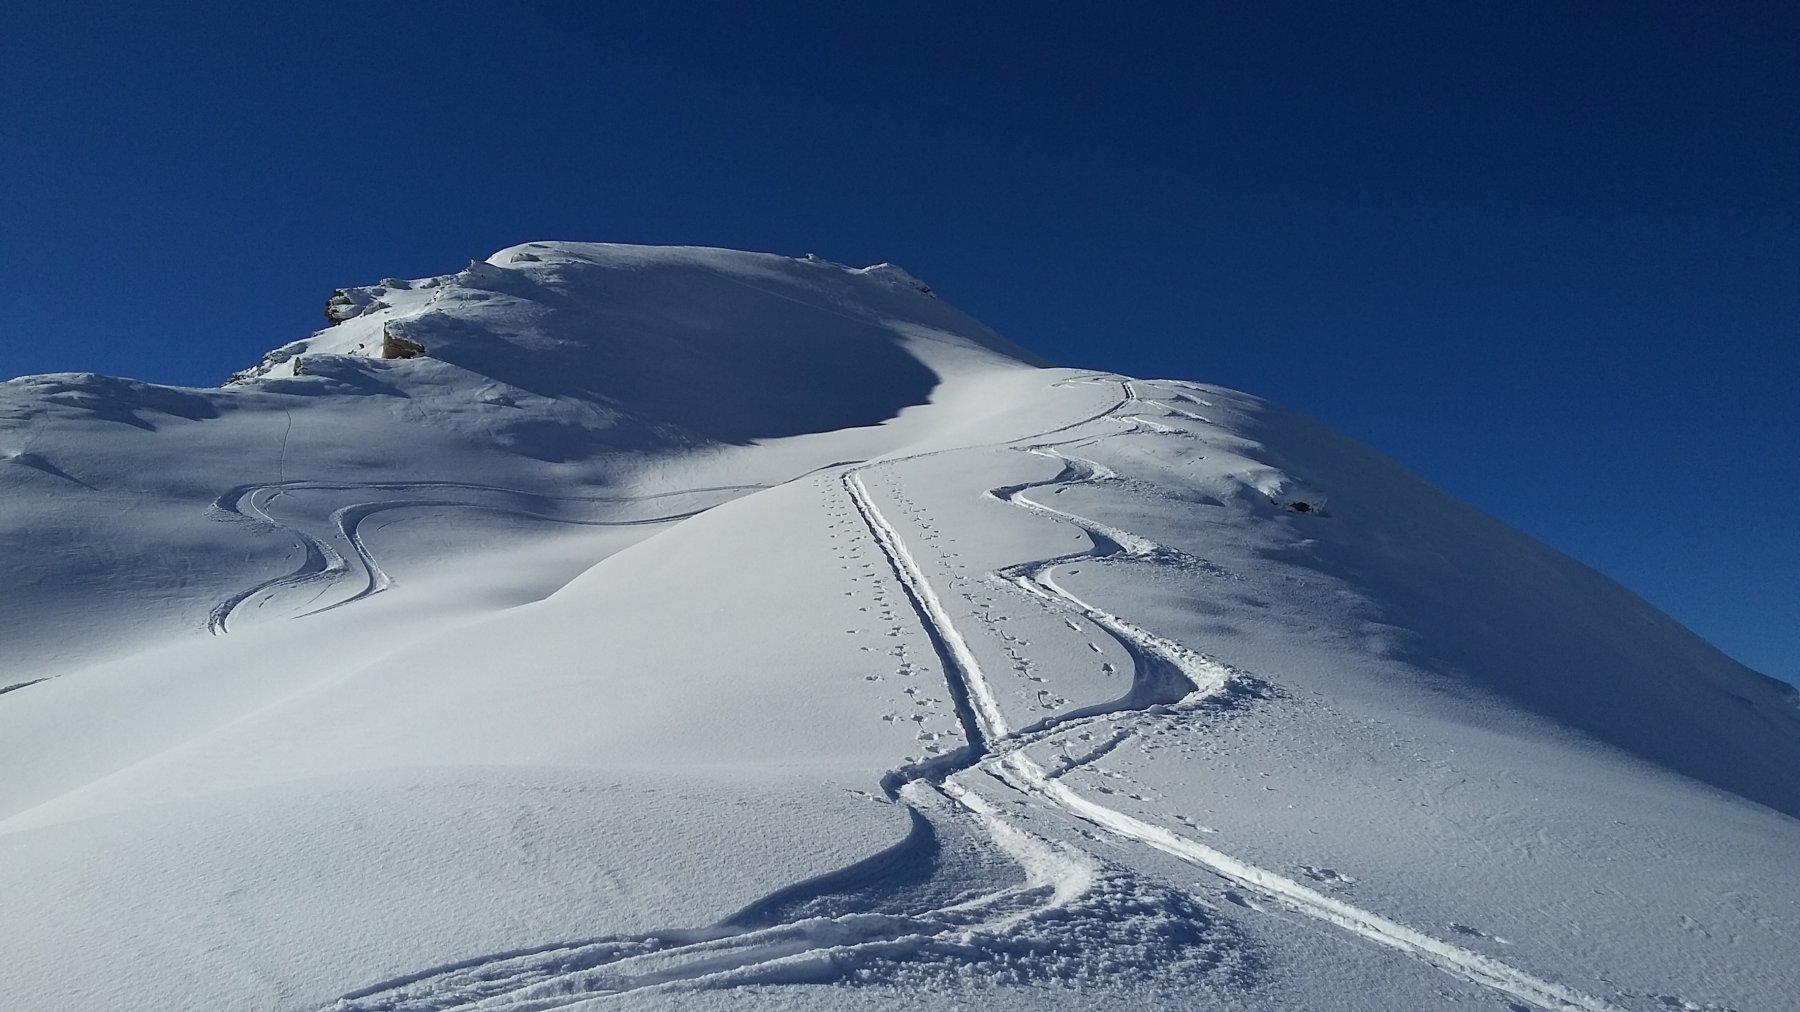 bella neve sotto la punta